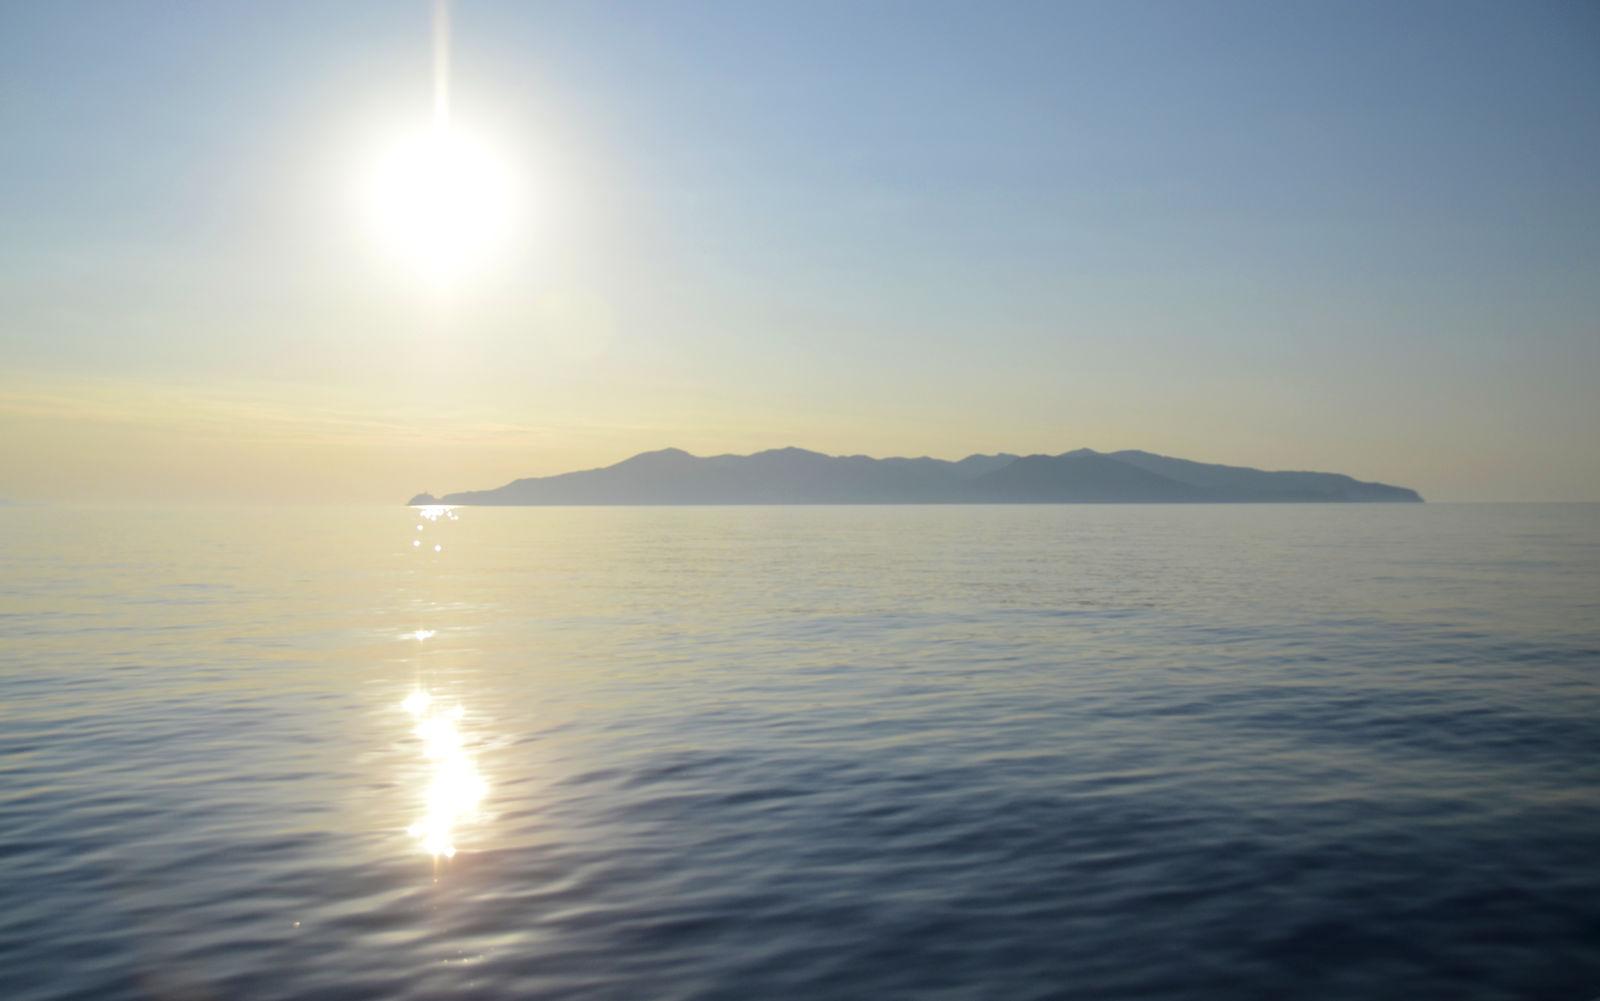 Capraia Isola - Capraia in a poem